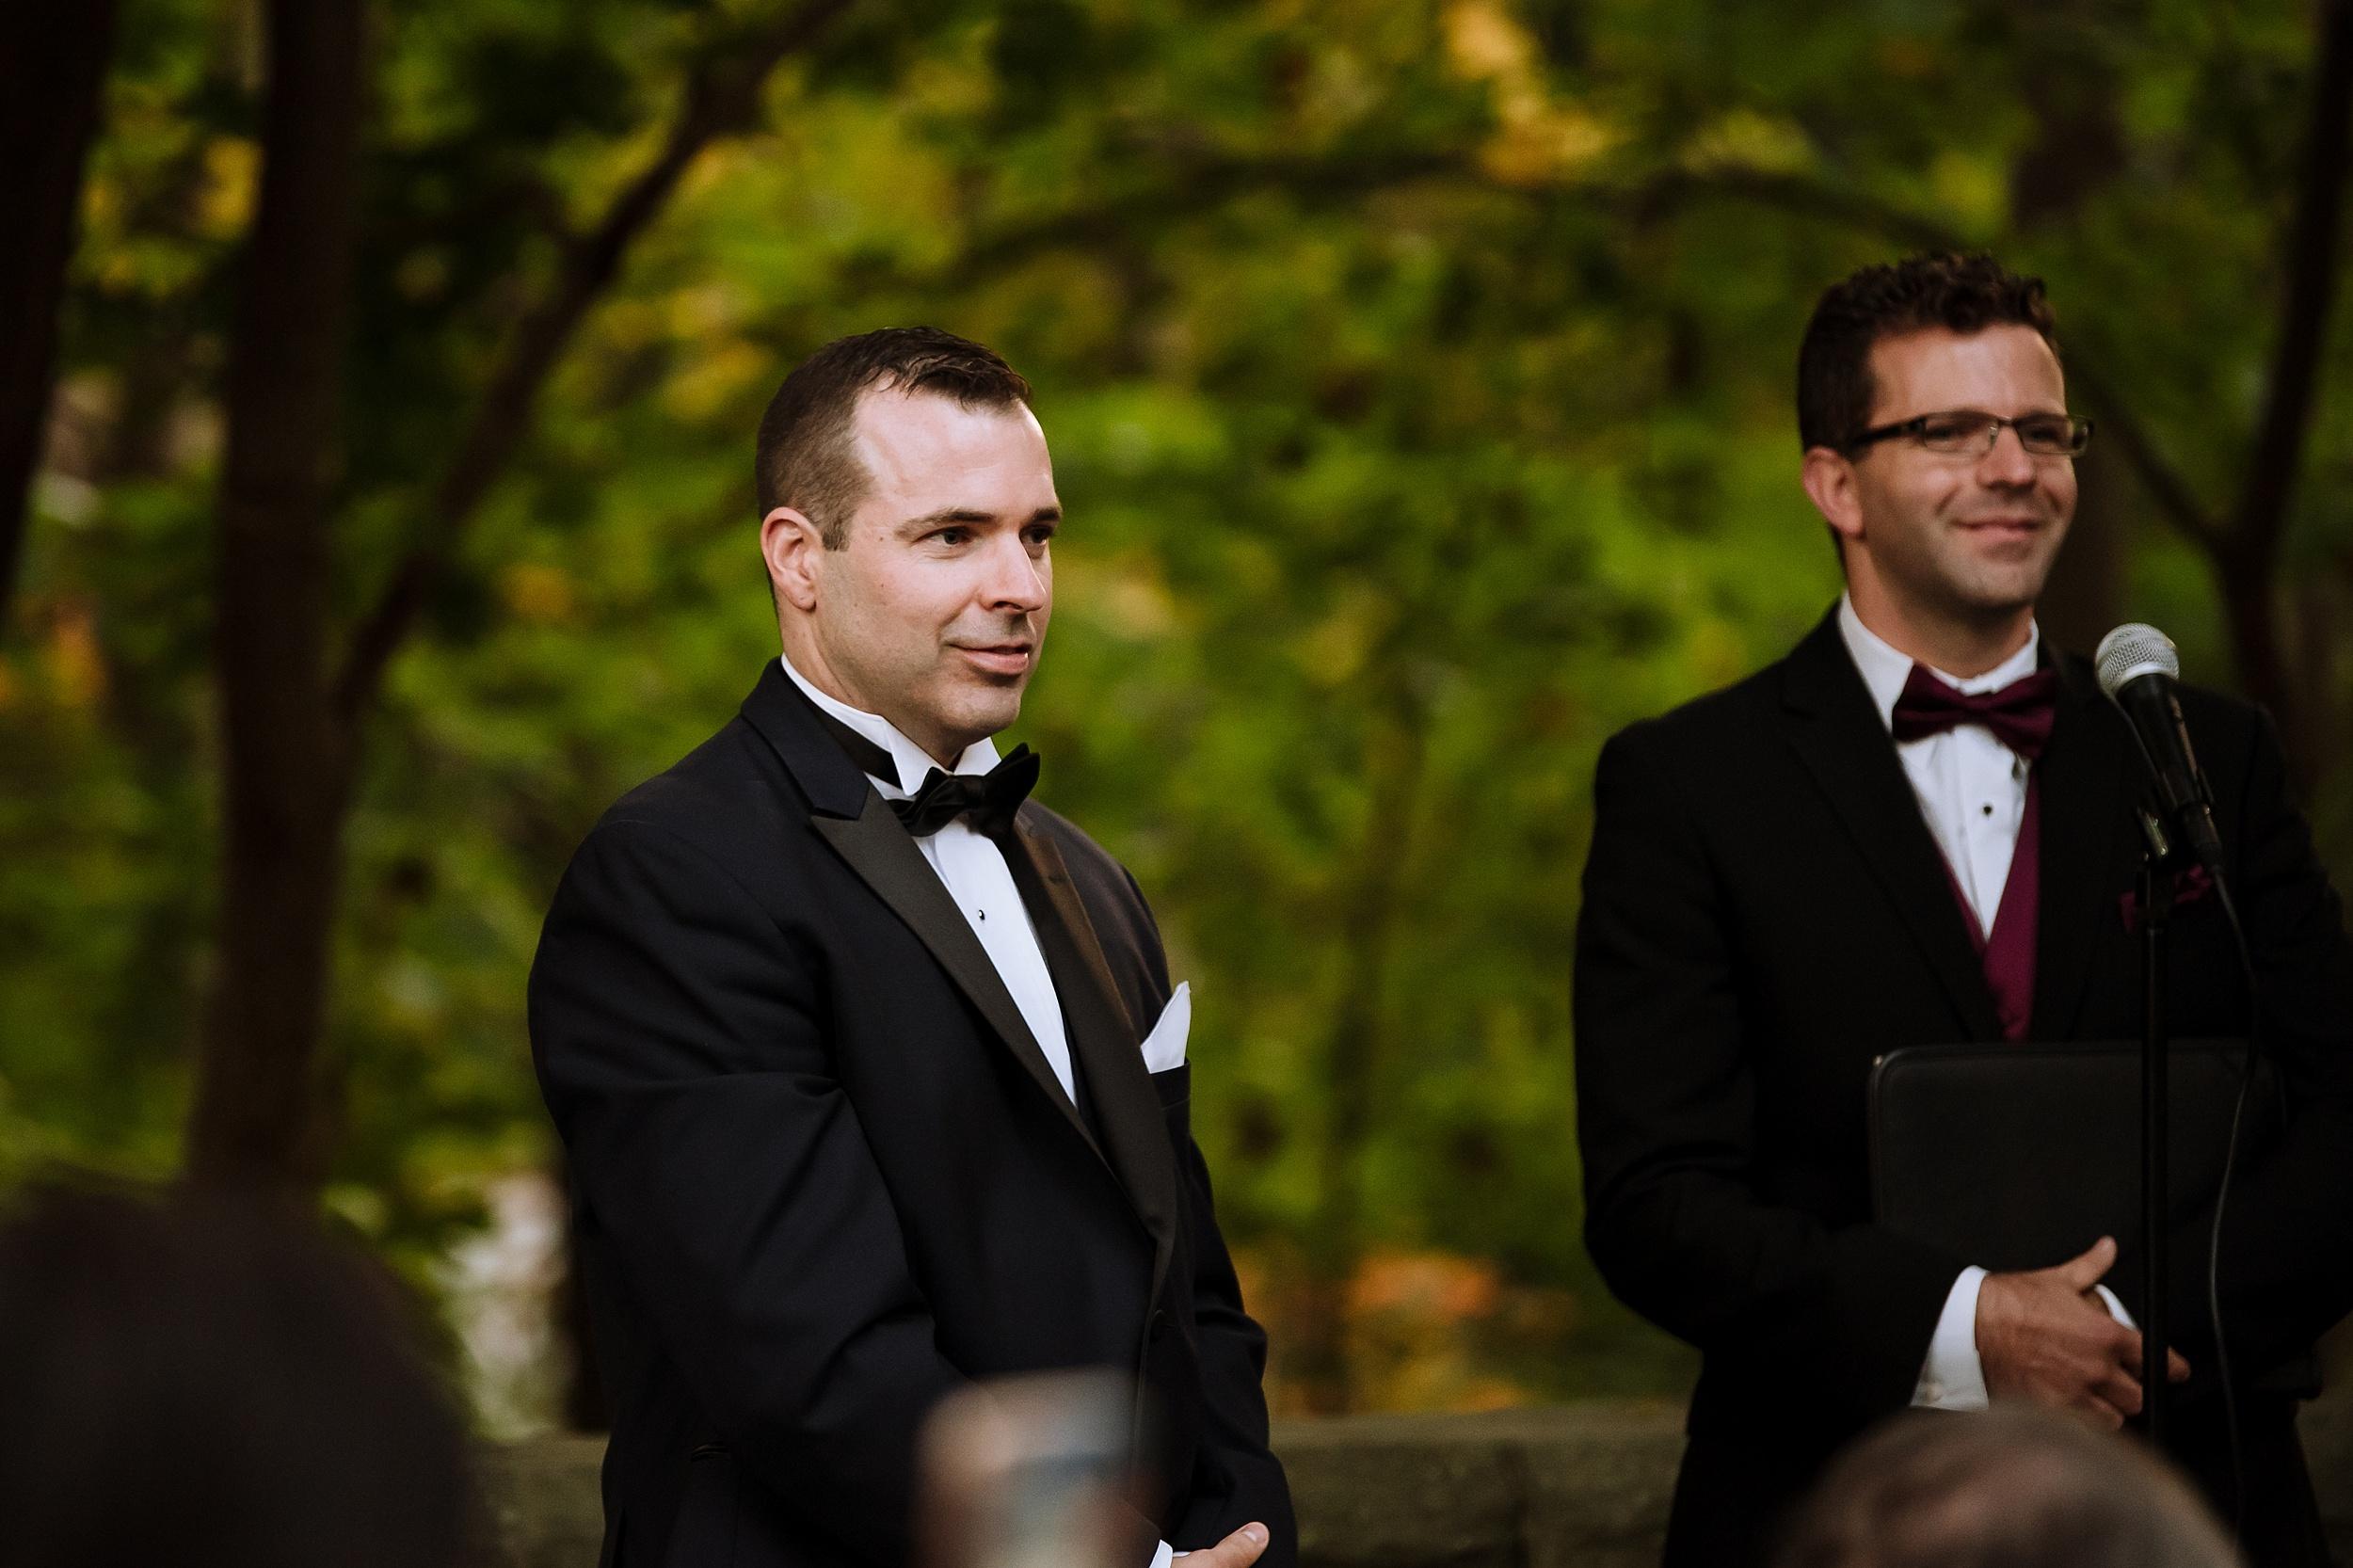 Sunnybrook_Estates_Alexander_Muir_Toronto_Wedding_Photographer_0046.jpg